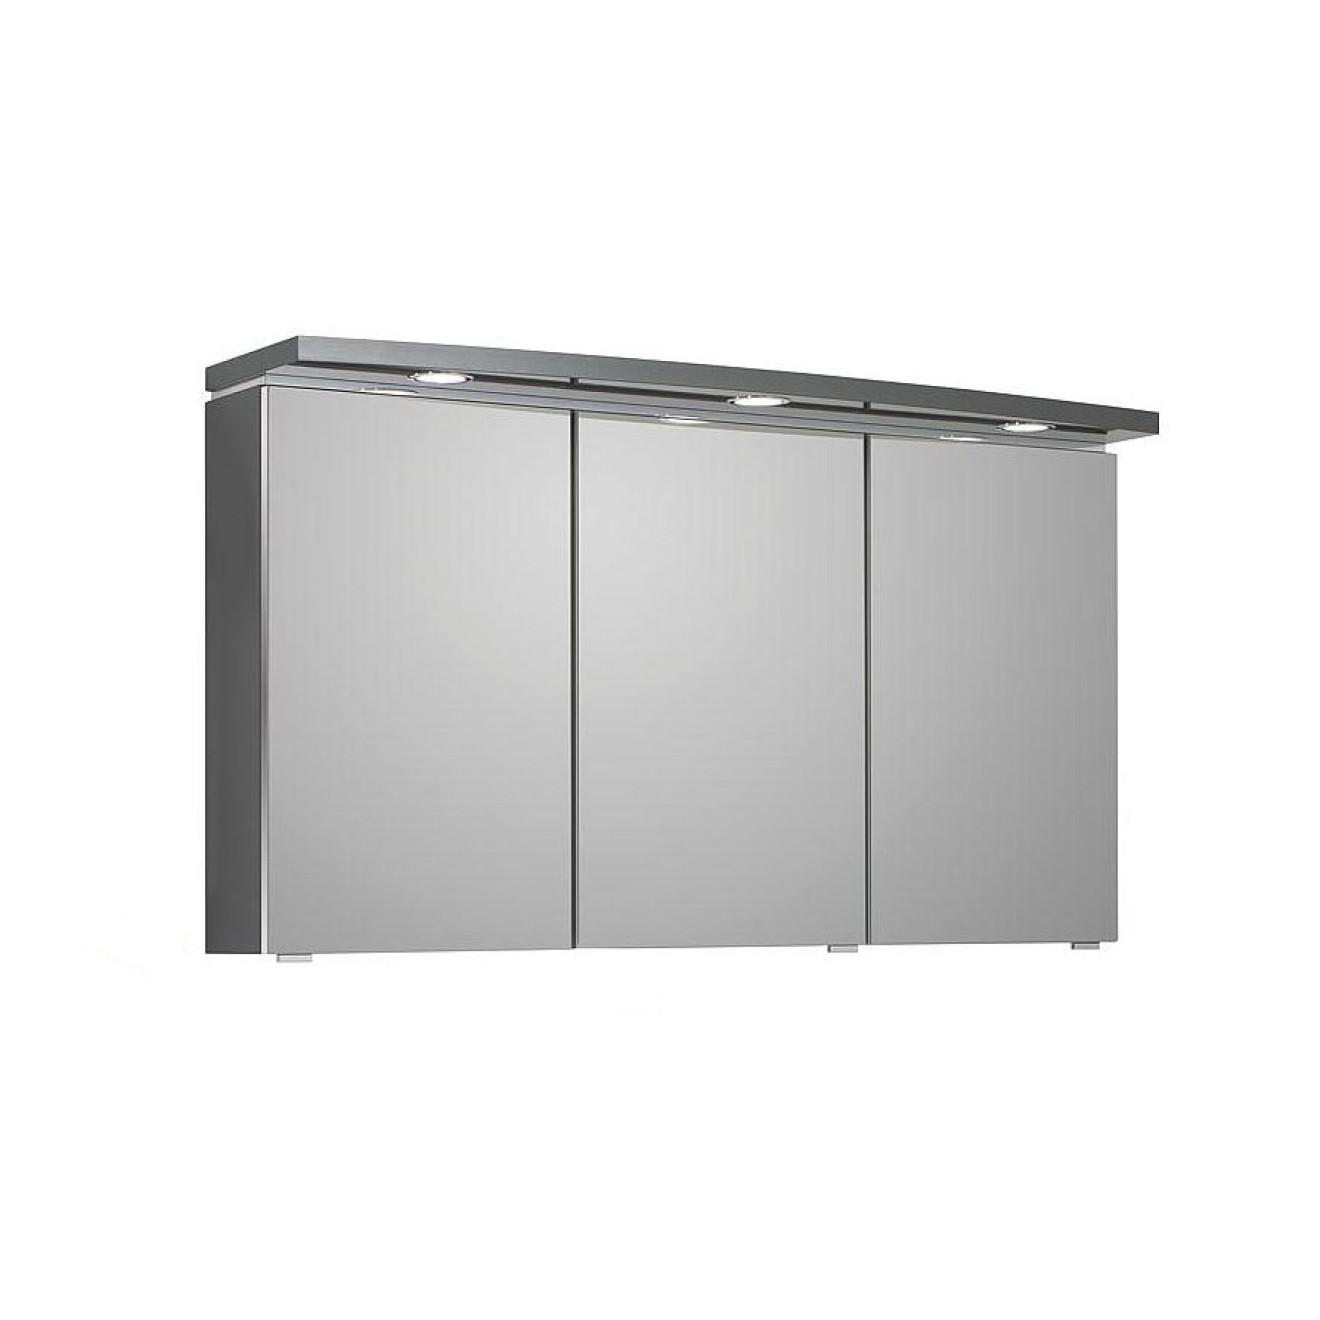 2d spiegelschrank 80 cm 3 t rig mit gesimsboden mit led. Black Bedroom Furniture Sets. Home Design Ideas